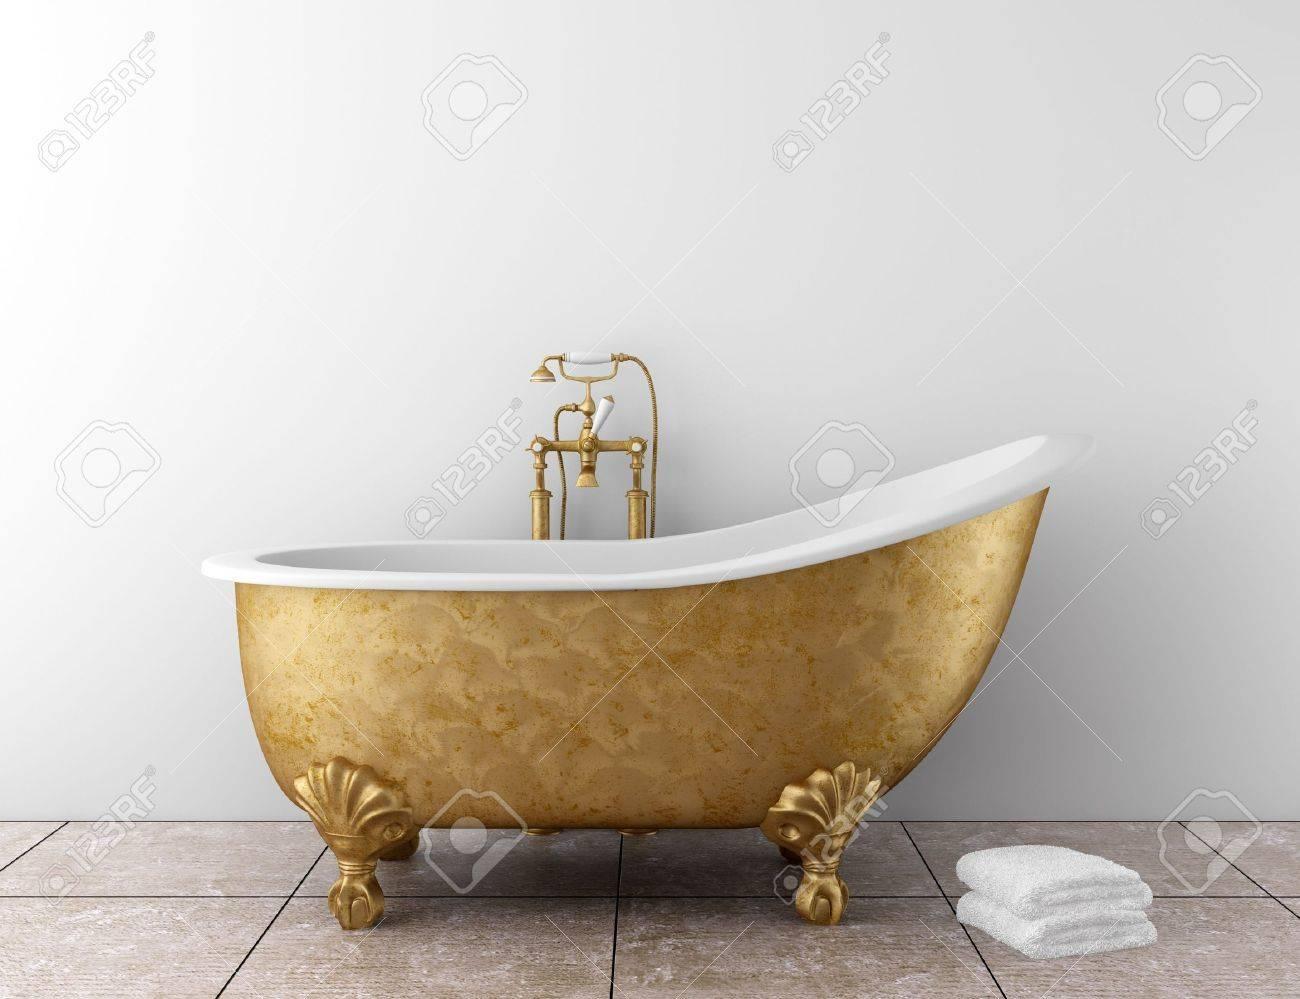 Vasche Da Bagno Colore Beige : Vasche da bagno angolari. Vasche ...